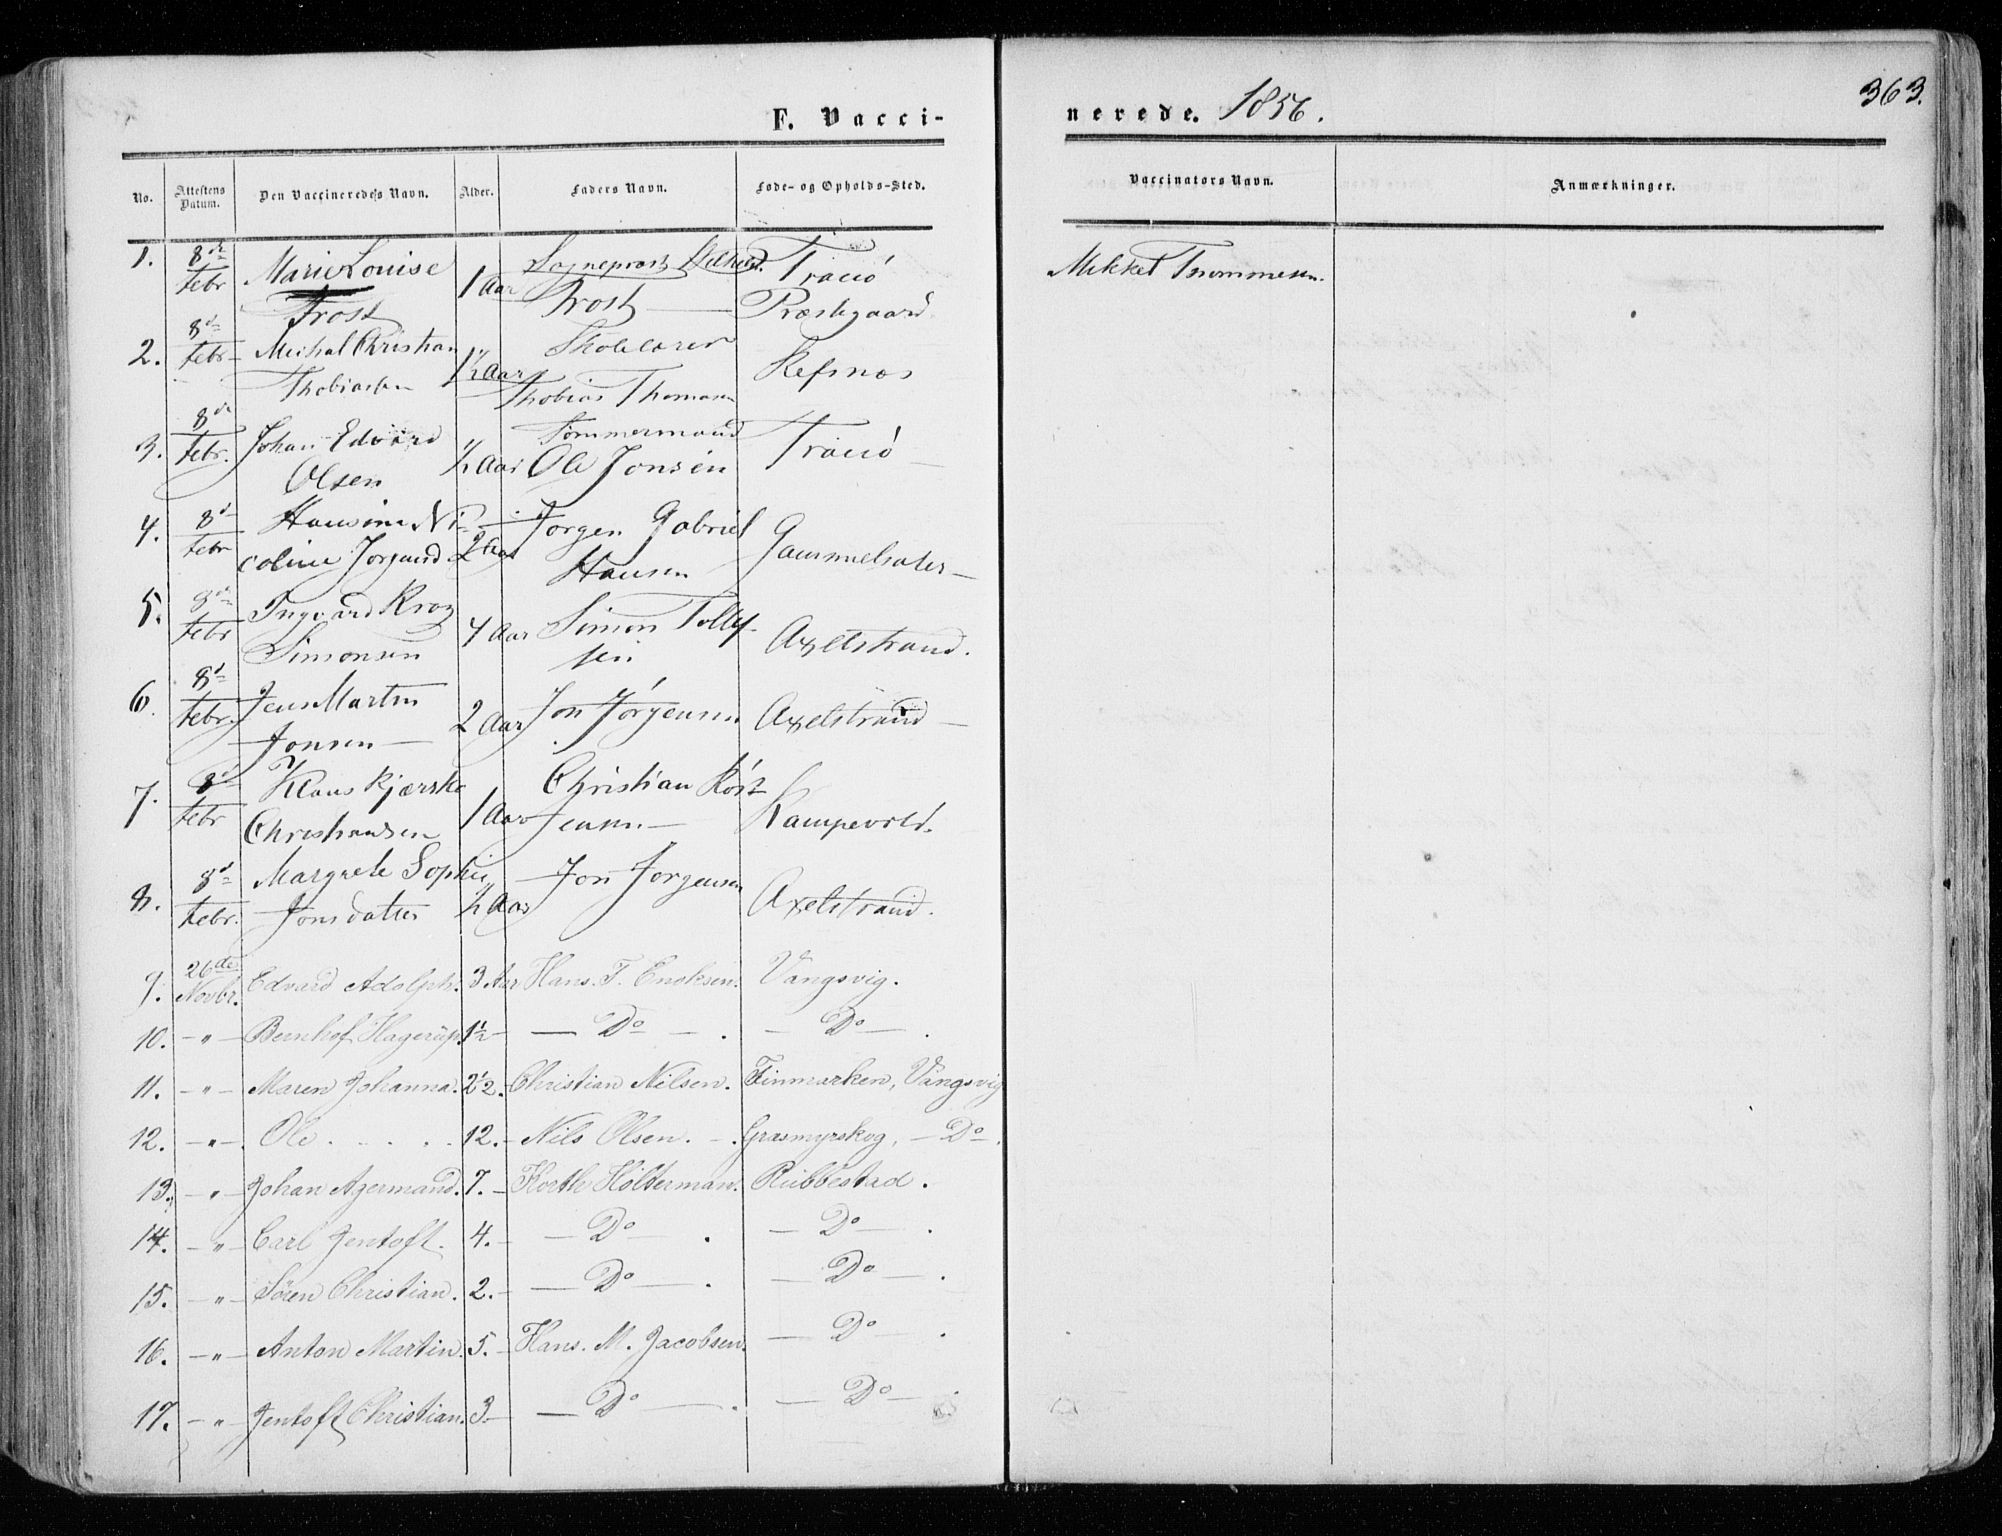 SATØ, Tranøy sokneprestkontor, I/Ia/Iaa/L0007kirke: Ministerialbok nr. 7, 1856-1866, s. 363